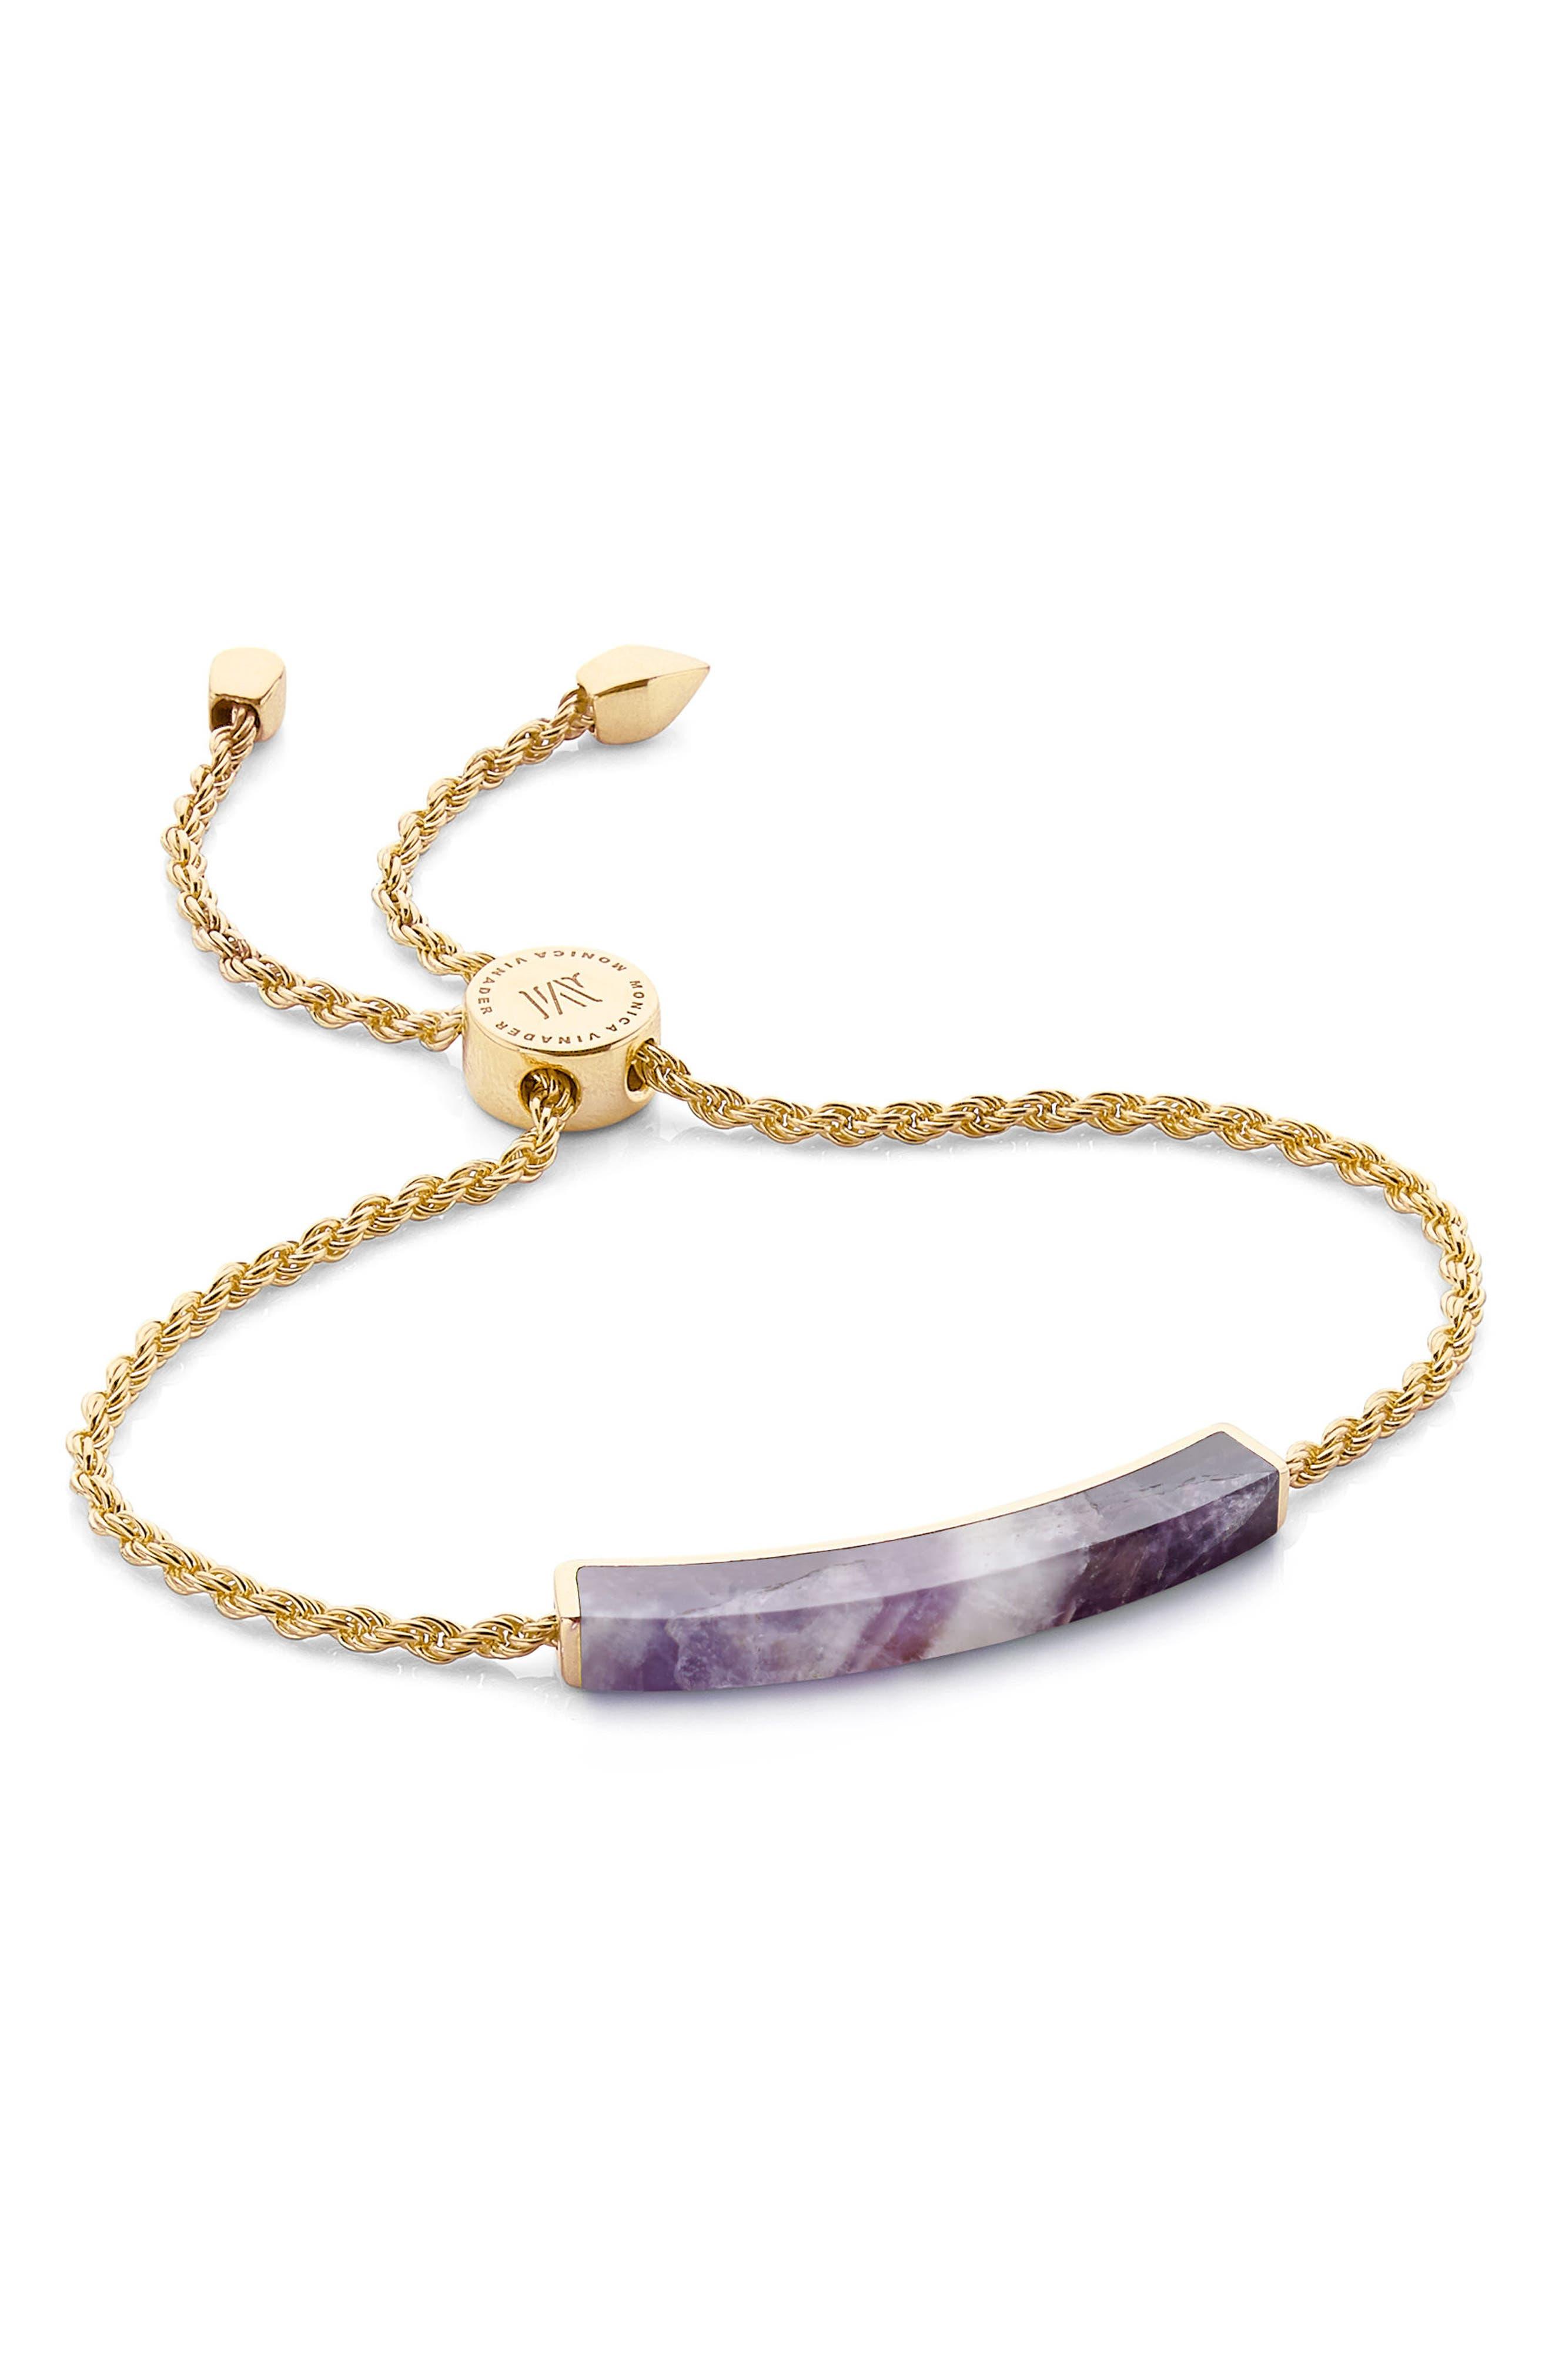 Main Image - Monica Vinader Linear Stone Friendship Bracelet